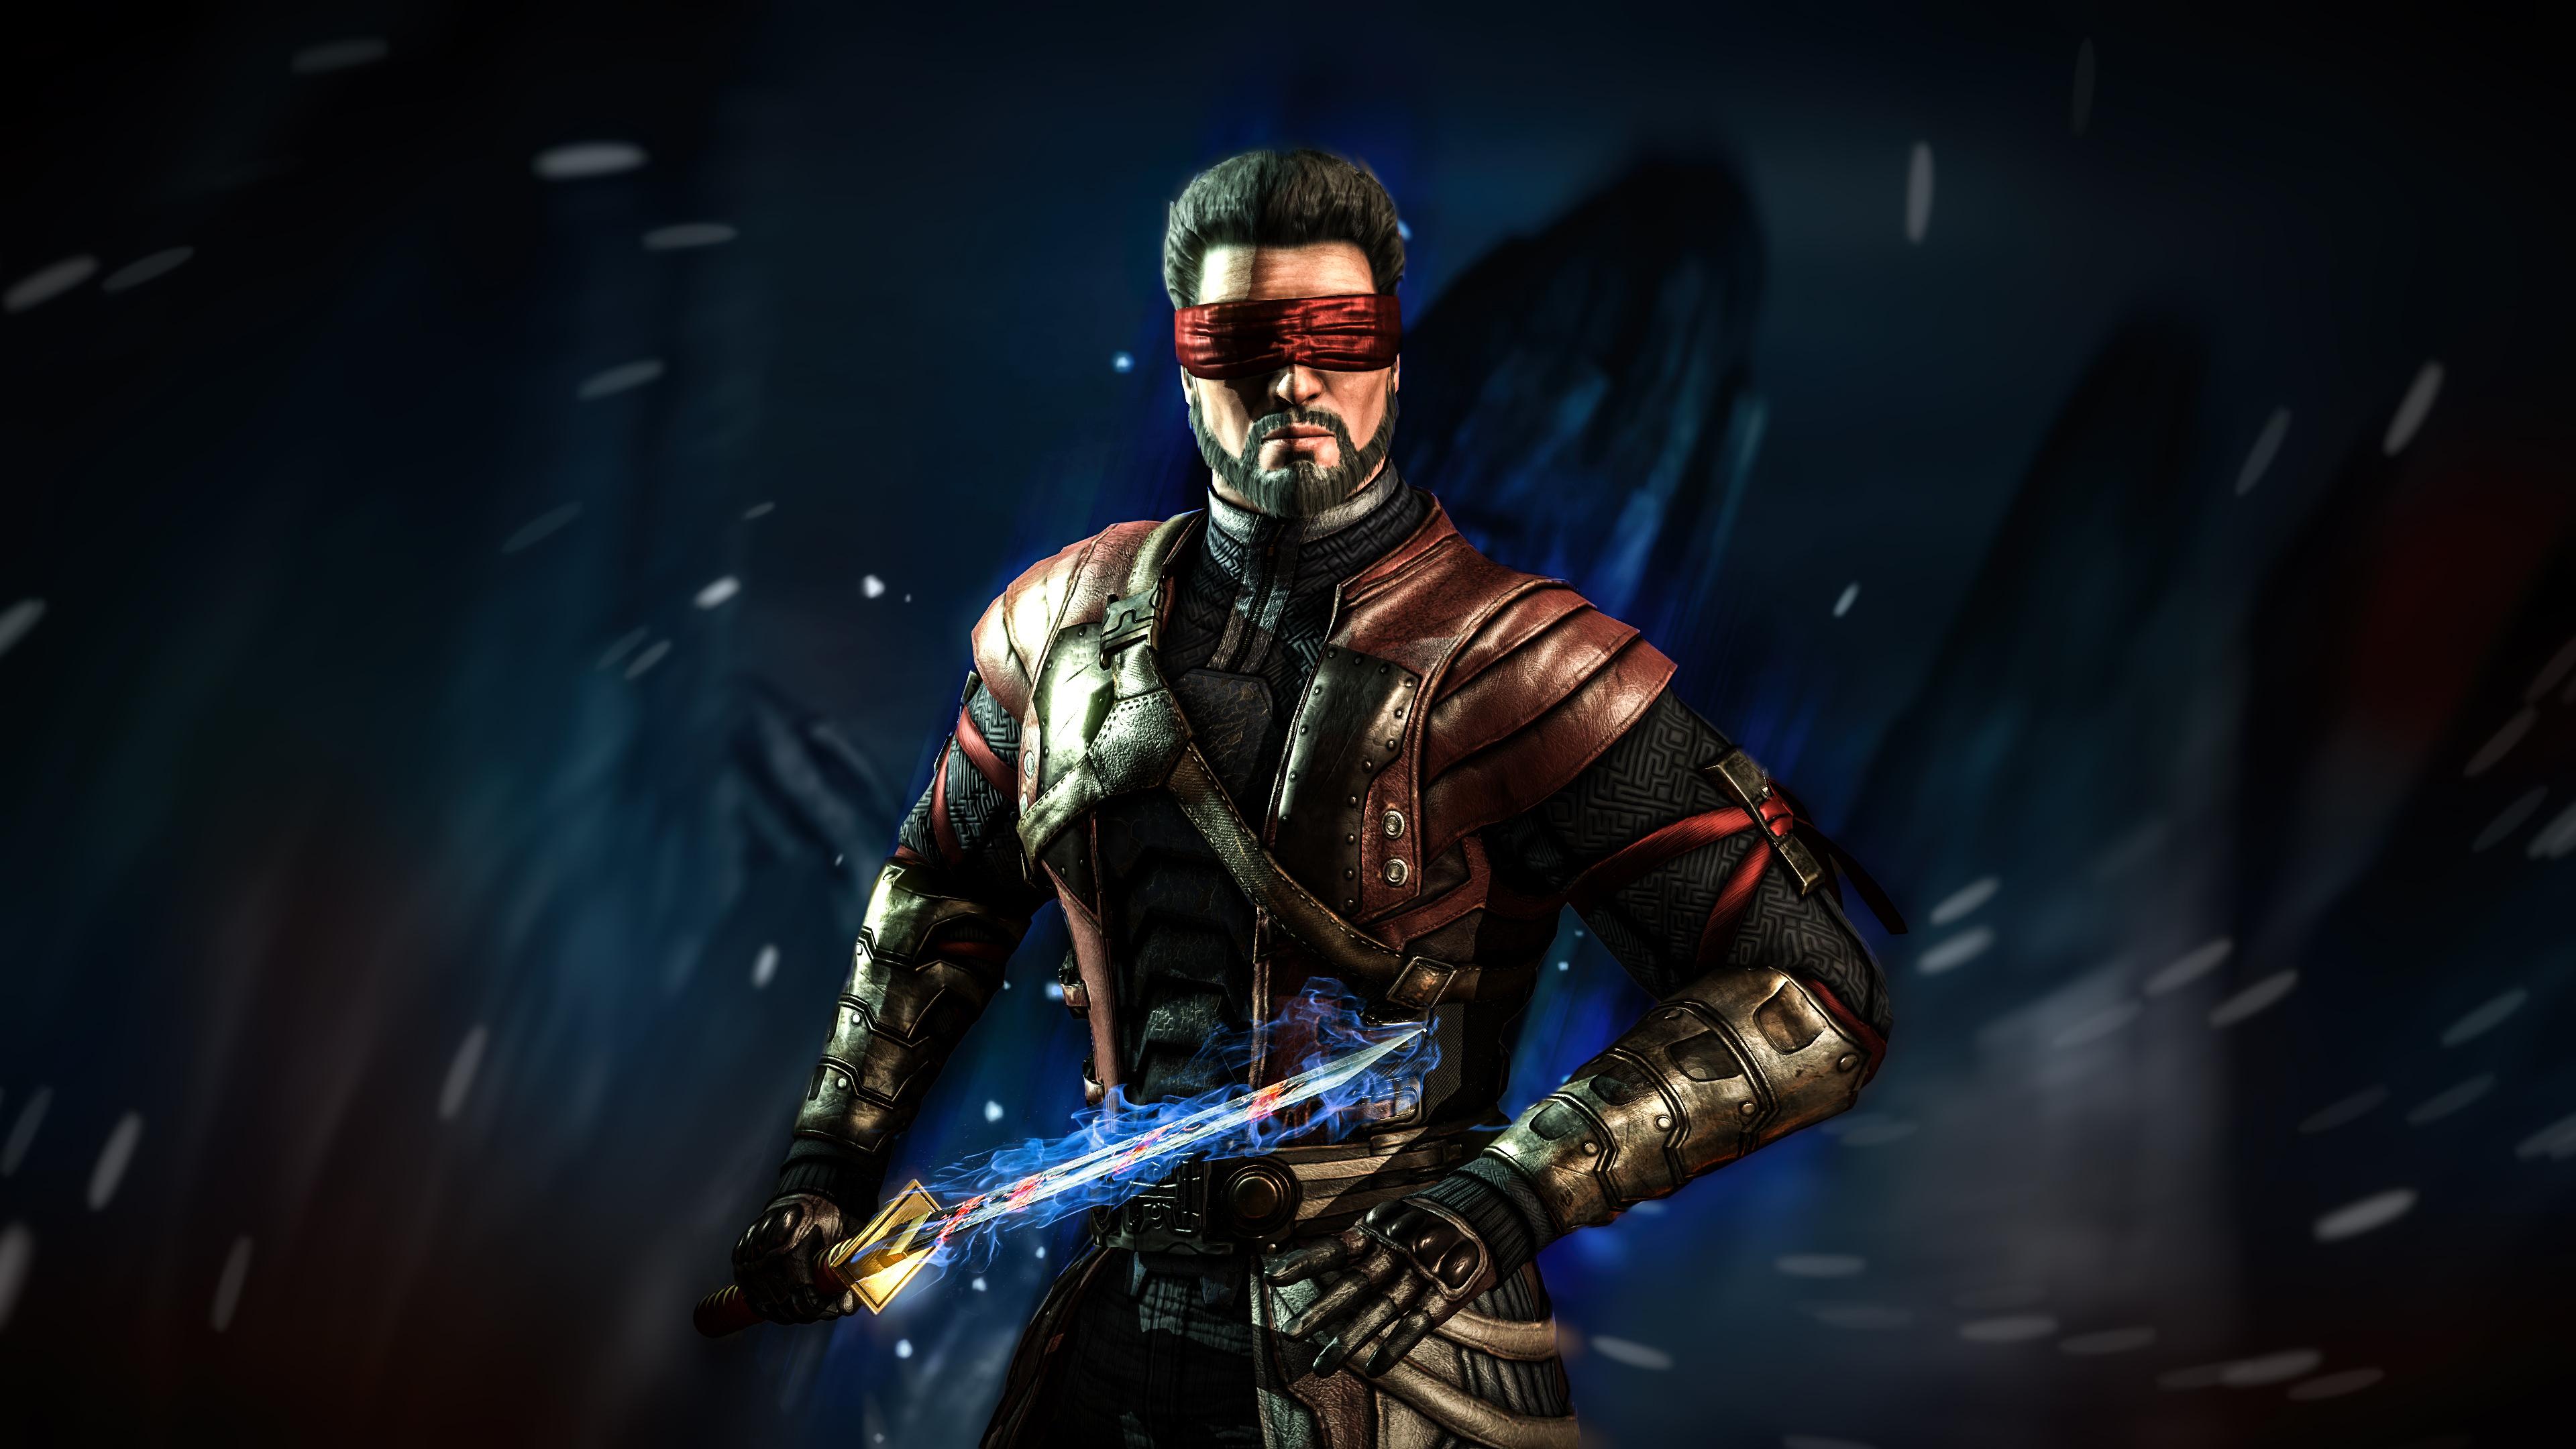 Wallpaper 4k Mortal Kombat X New 4k 4k Wallpapers Games